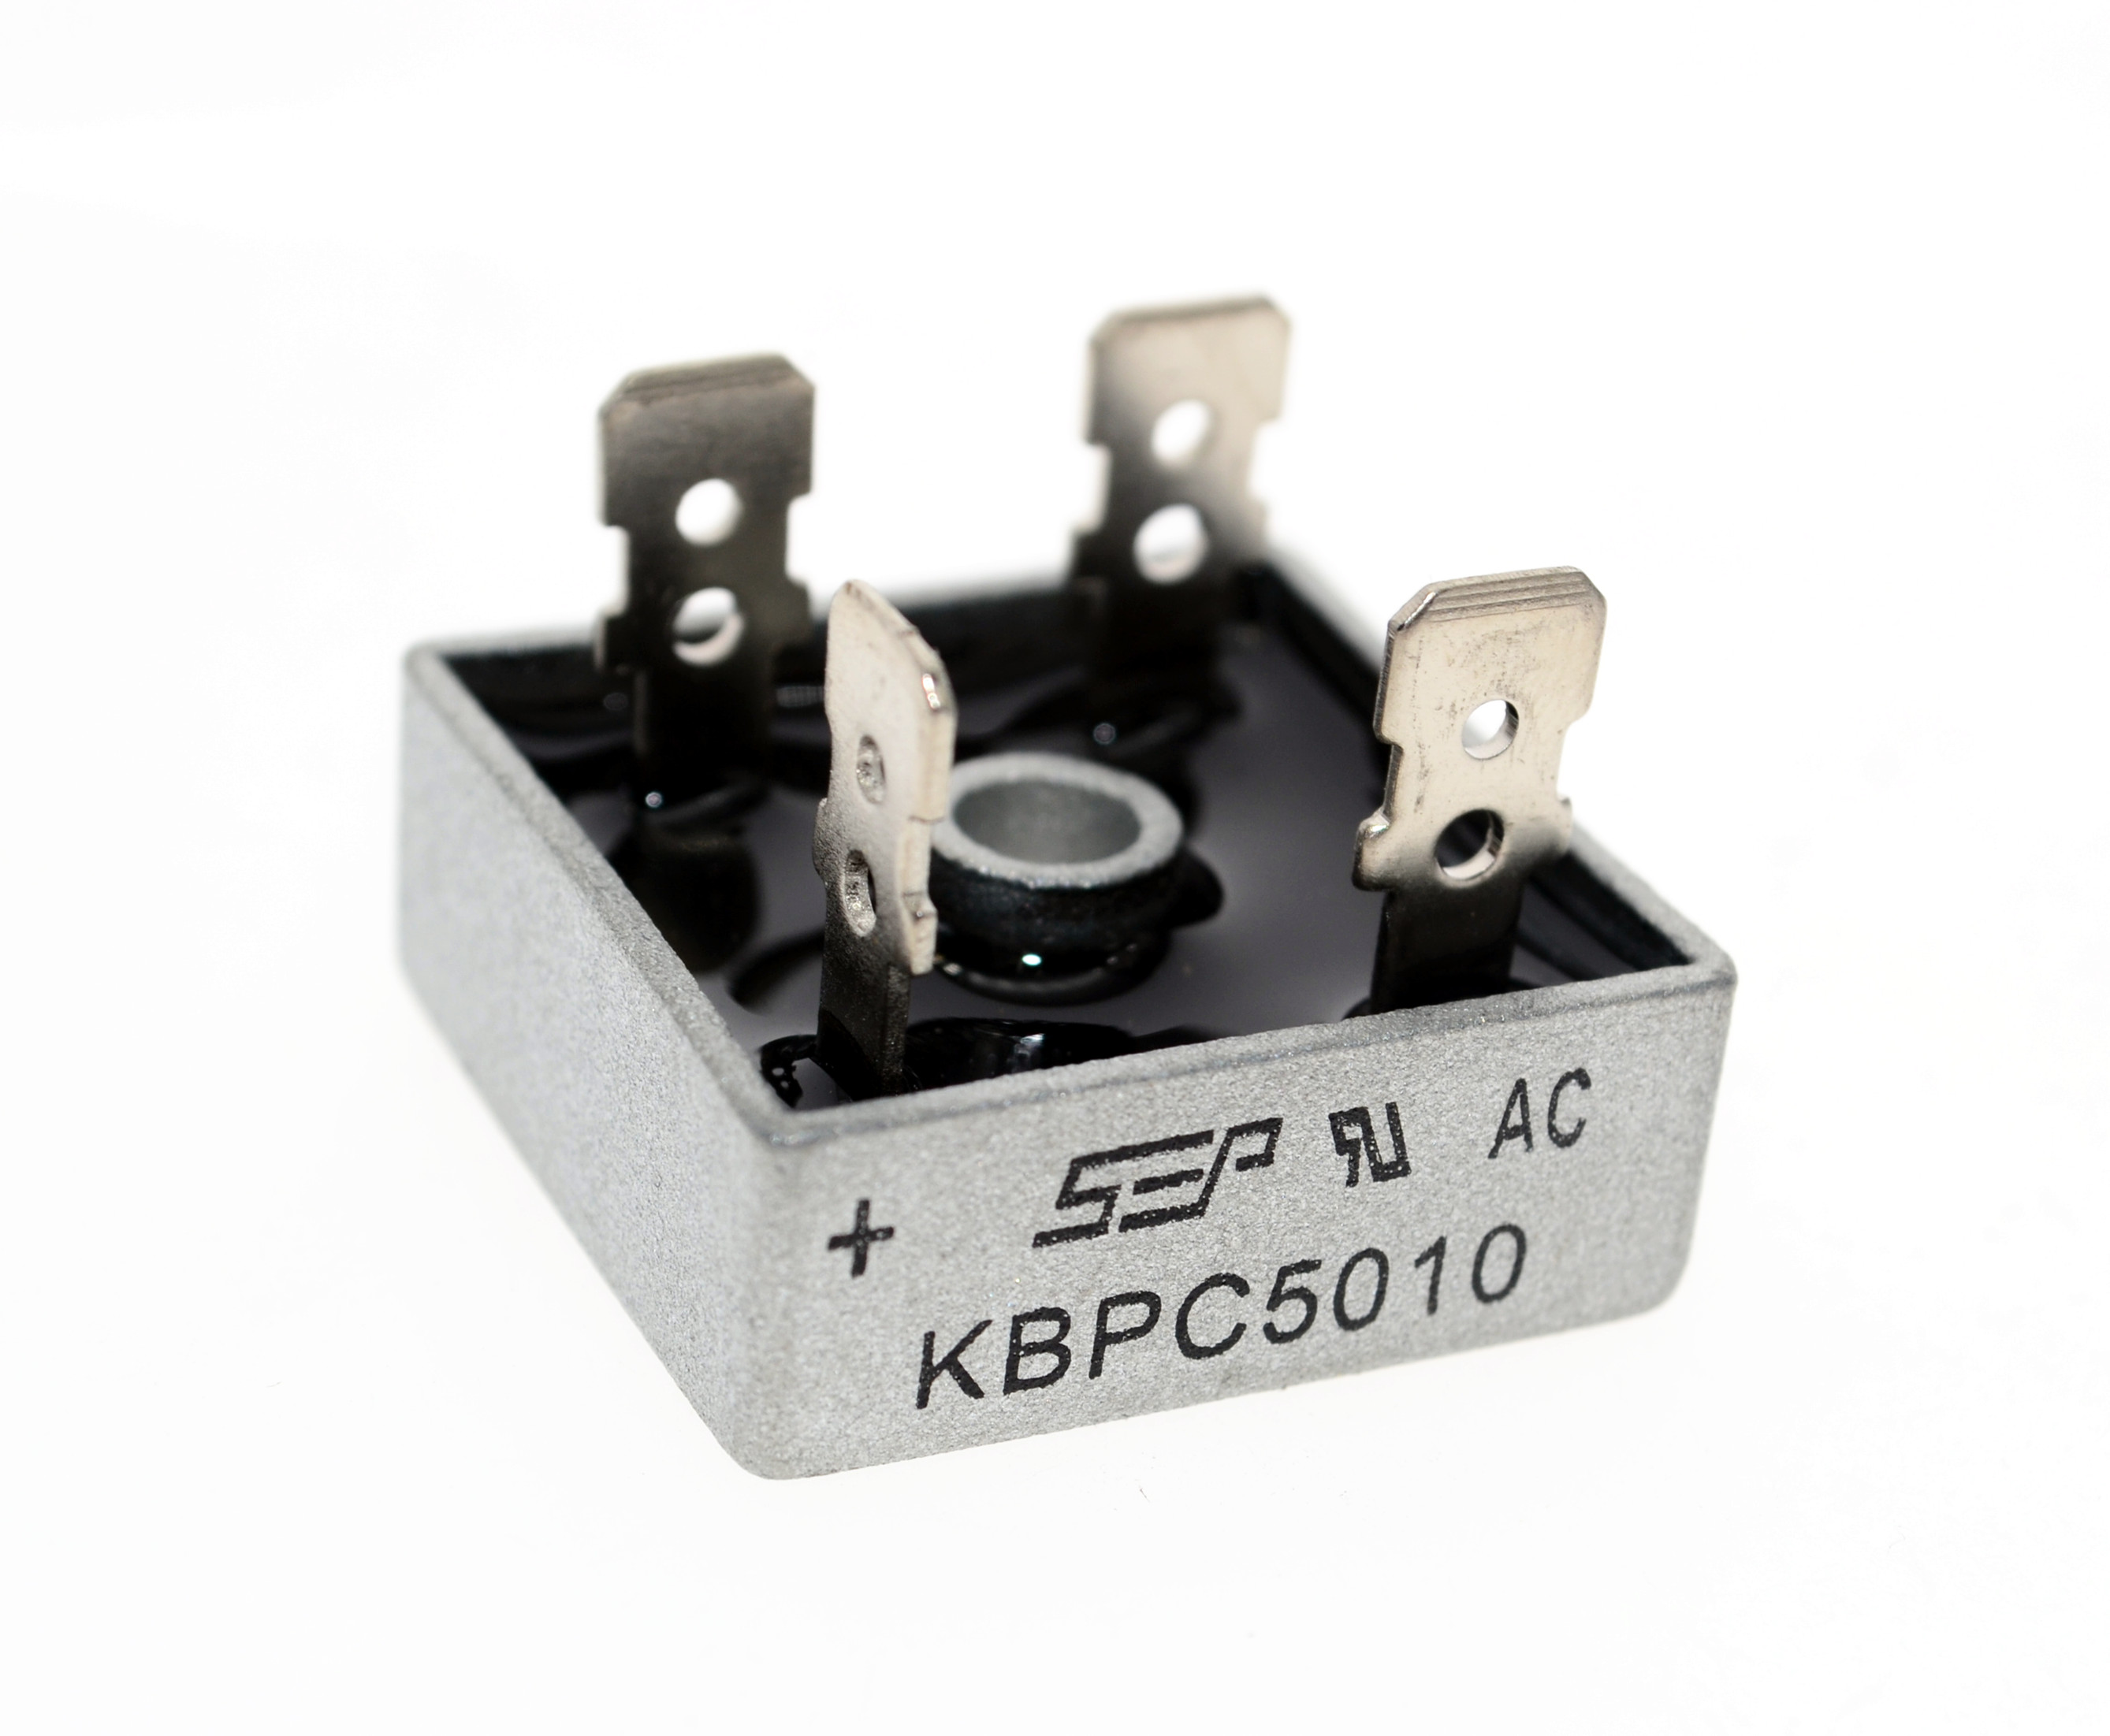 Free Shipping 10pcs KBPC5010 Fangqiao 50A1000V SEP Genuine Single-phase Bridge Rectifier Quality Assurance